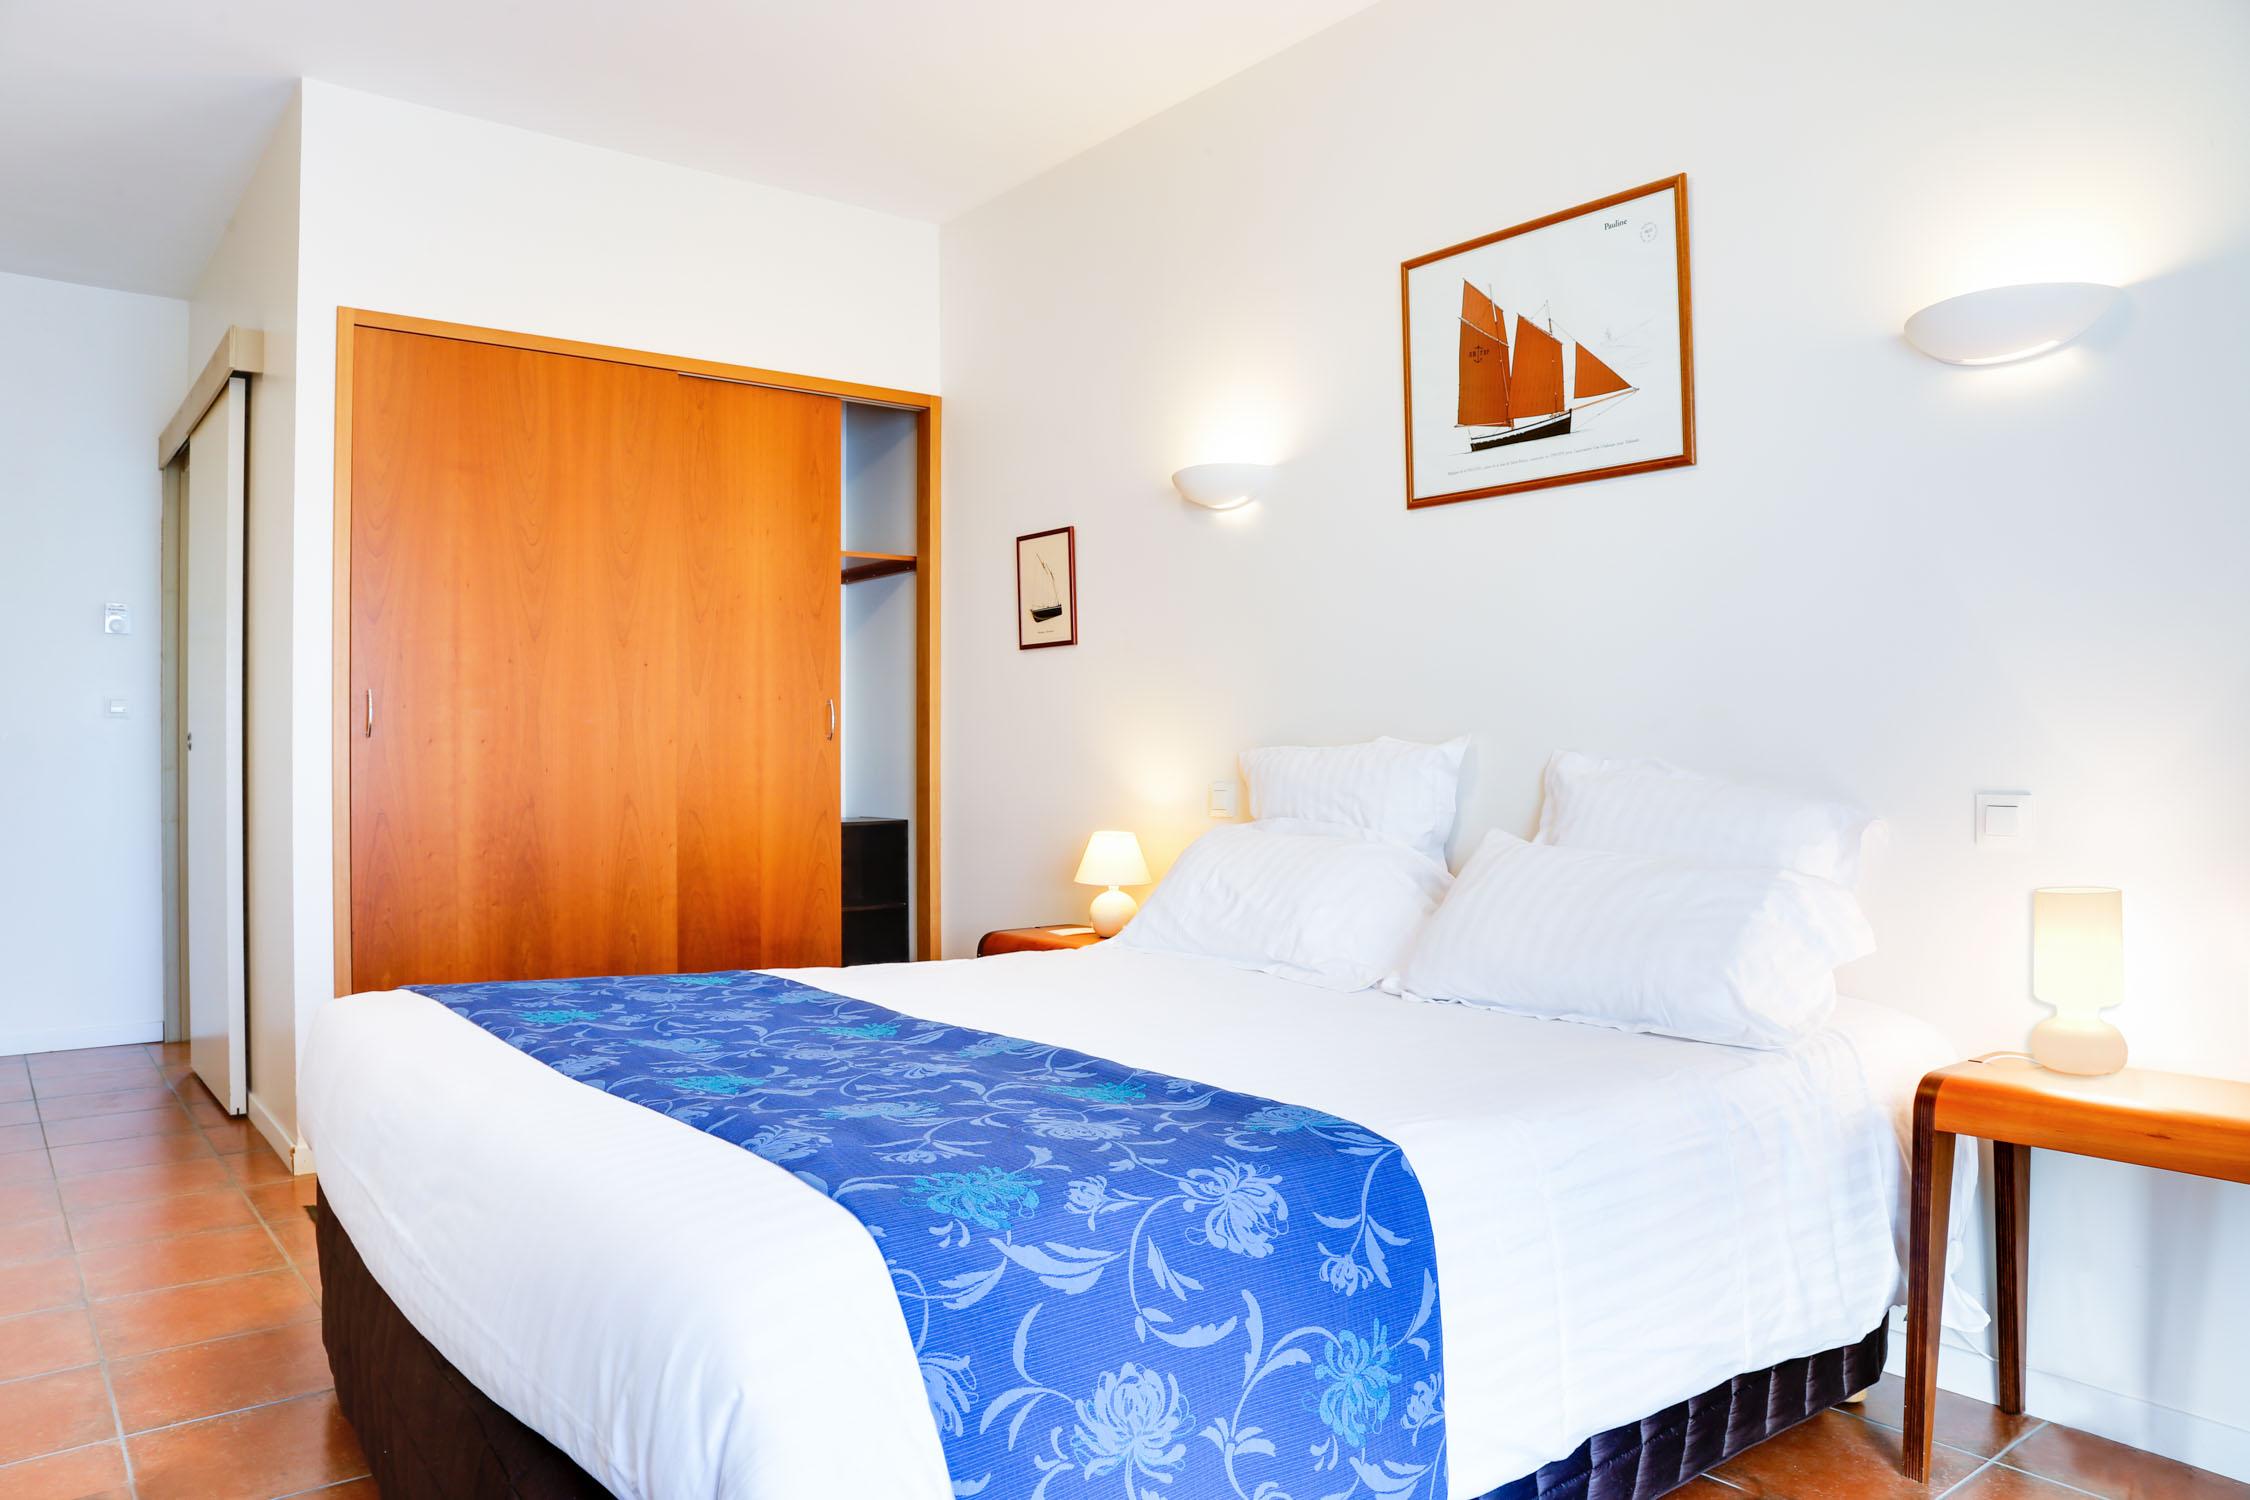 L h tel en vid o hotel chevalier gambette - Humidifier l air d une chambre ...